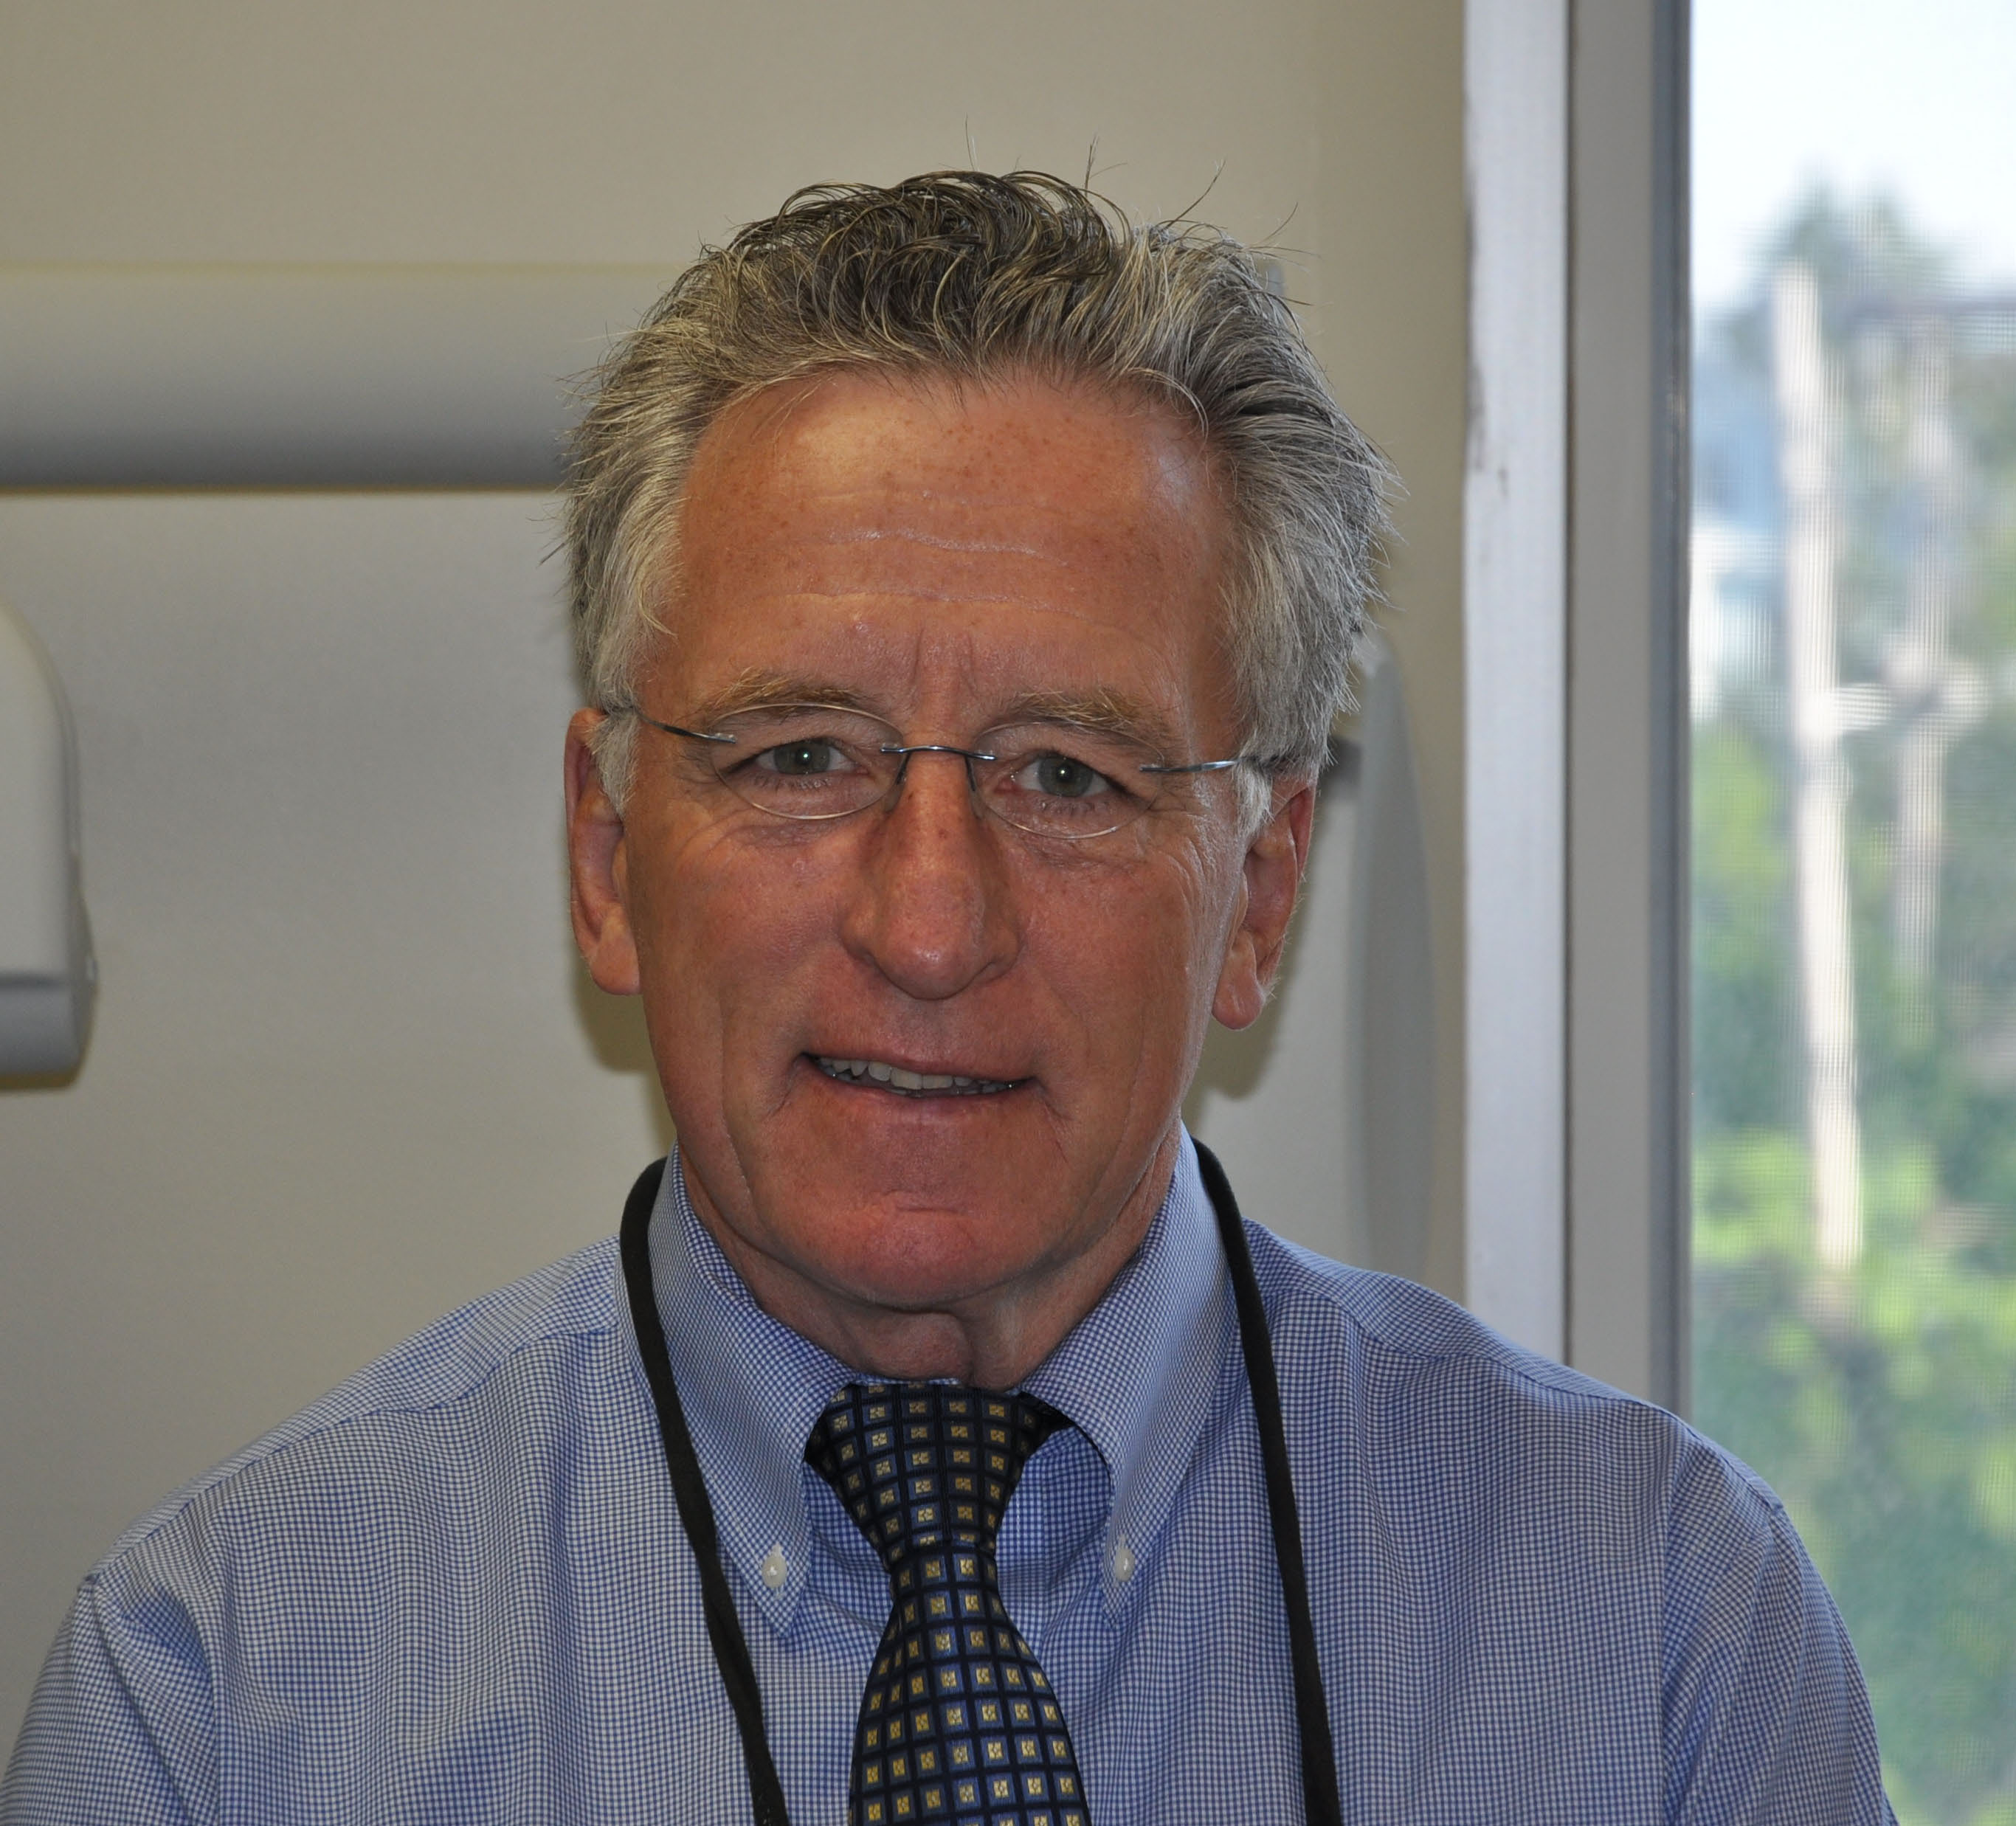 Dr Thomas Mone Now Offers Alternative Option To Treat